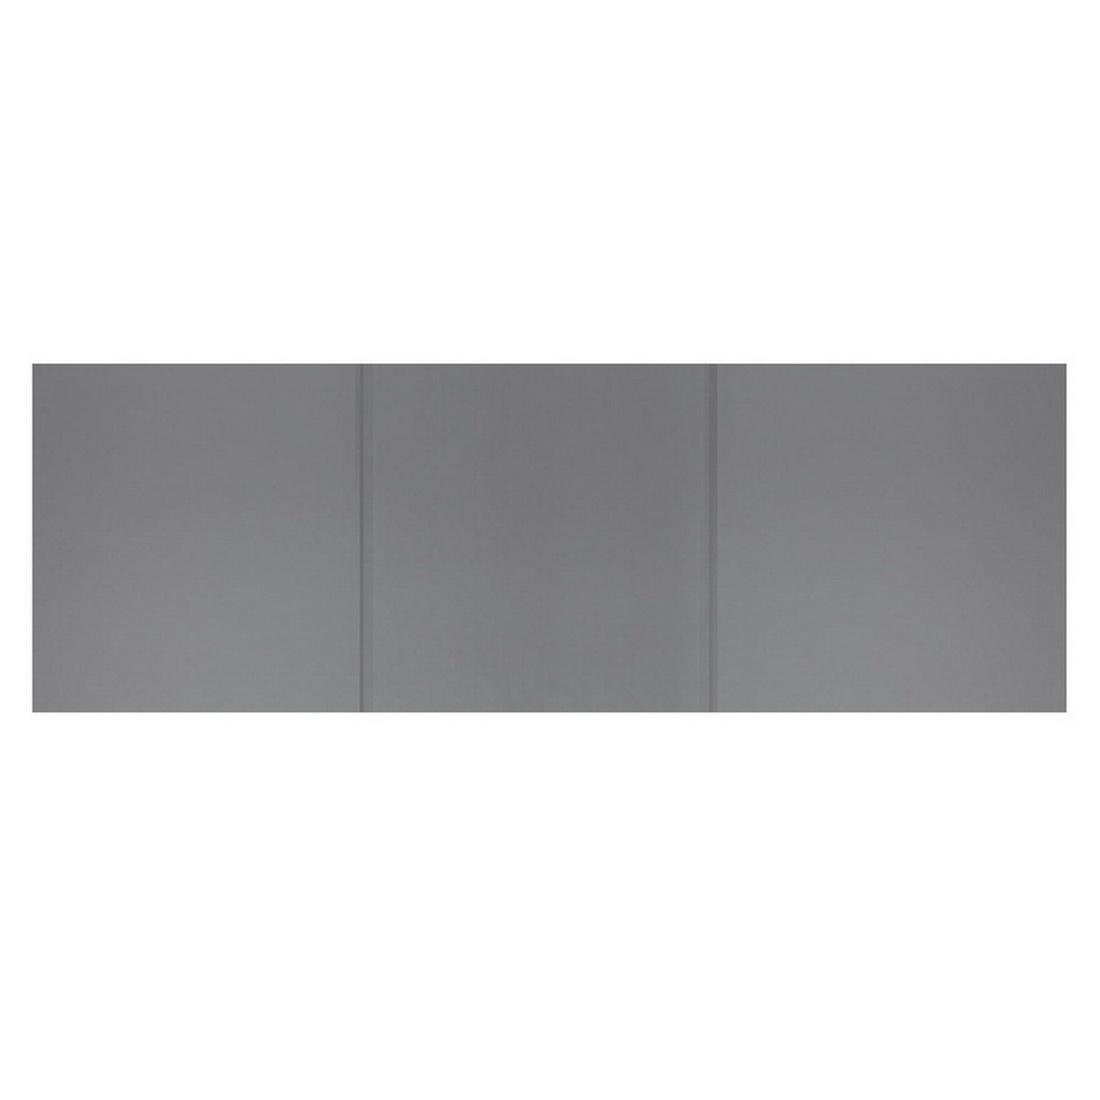 Axon Panel 400mm Smooth 3000 x 1200 x 9mm